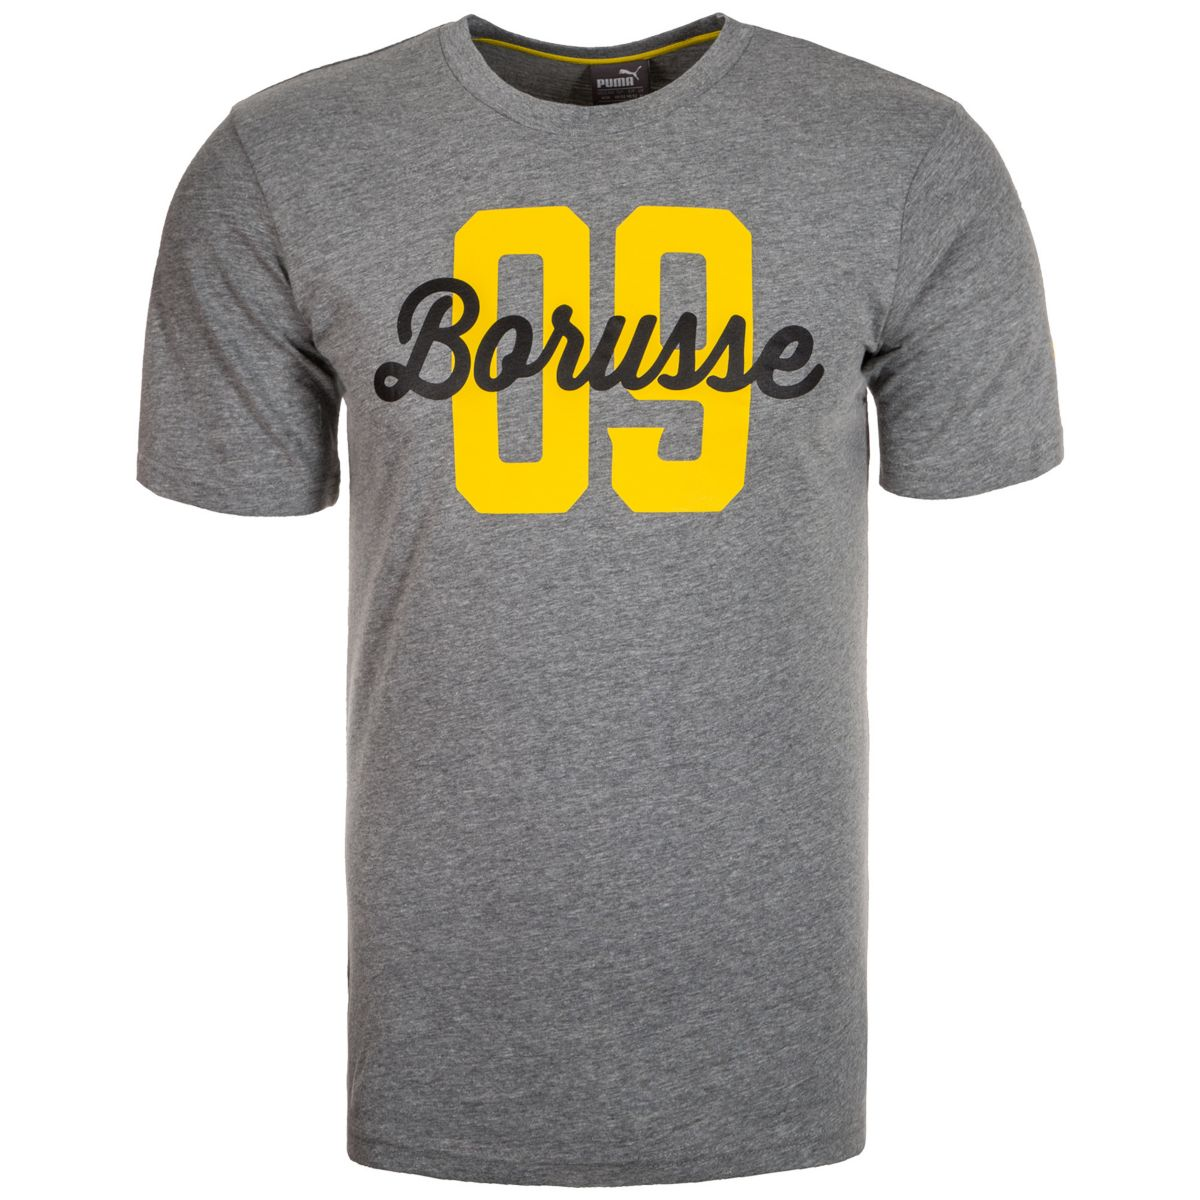 PUMA T-Shirt »Borussia Dortmund«